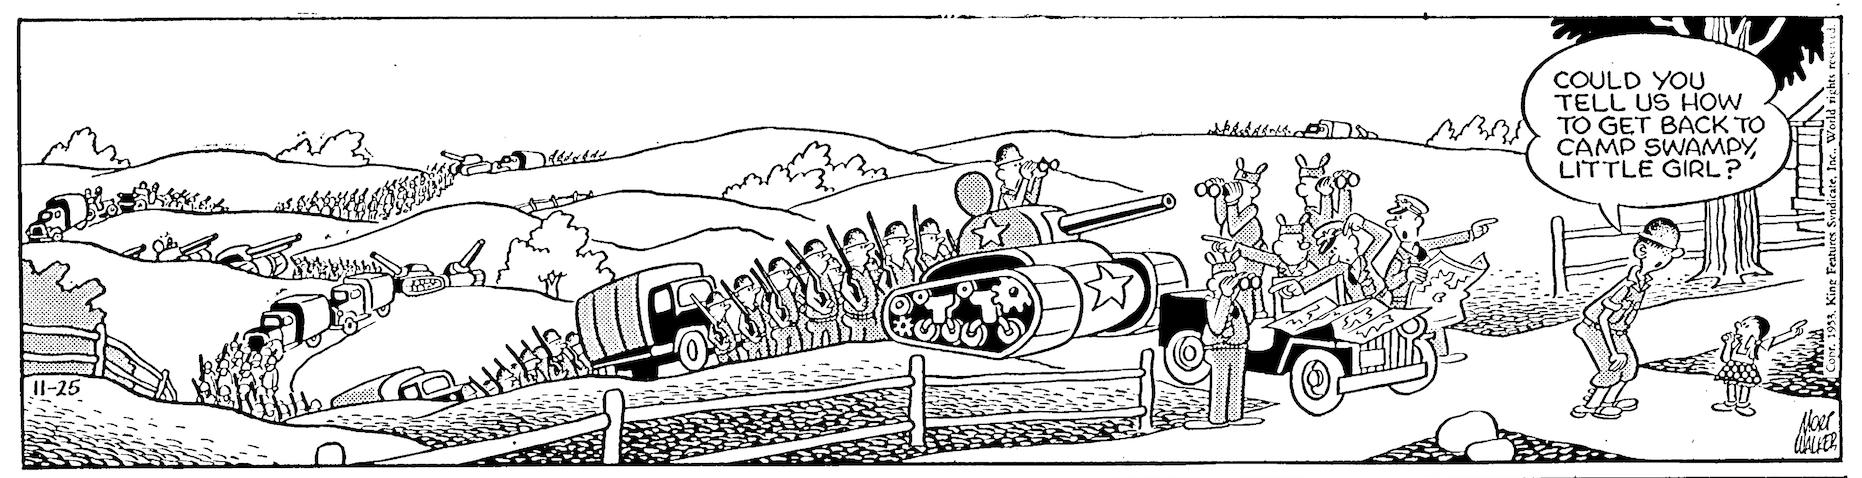 Beetle Bailey daily strip, November 25, 1953.